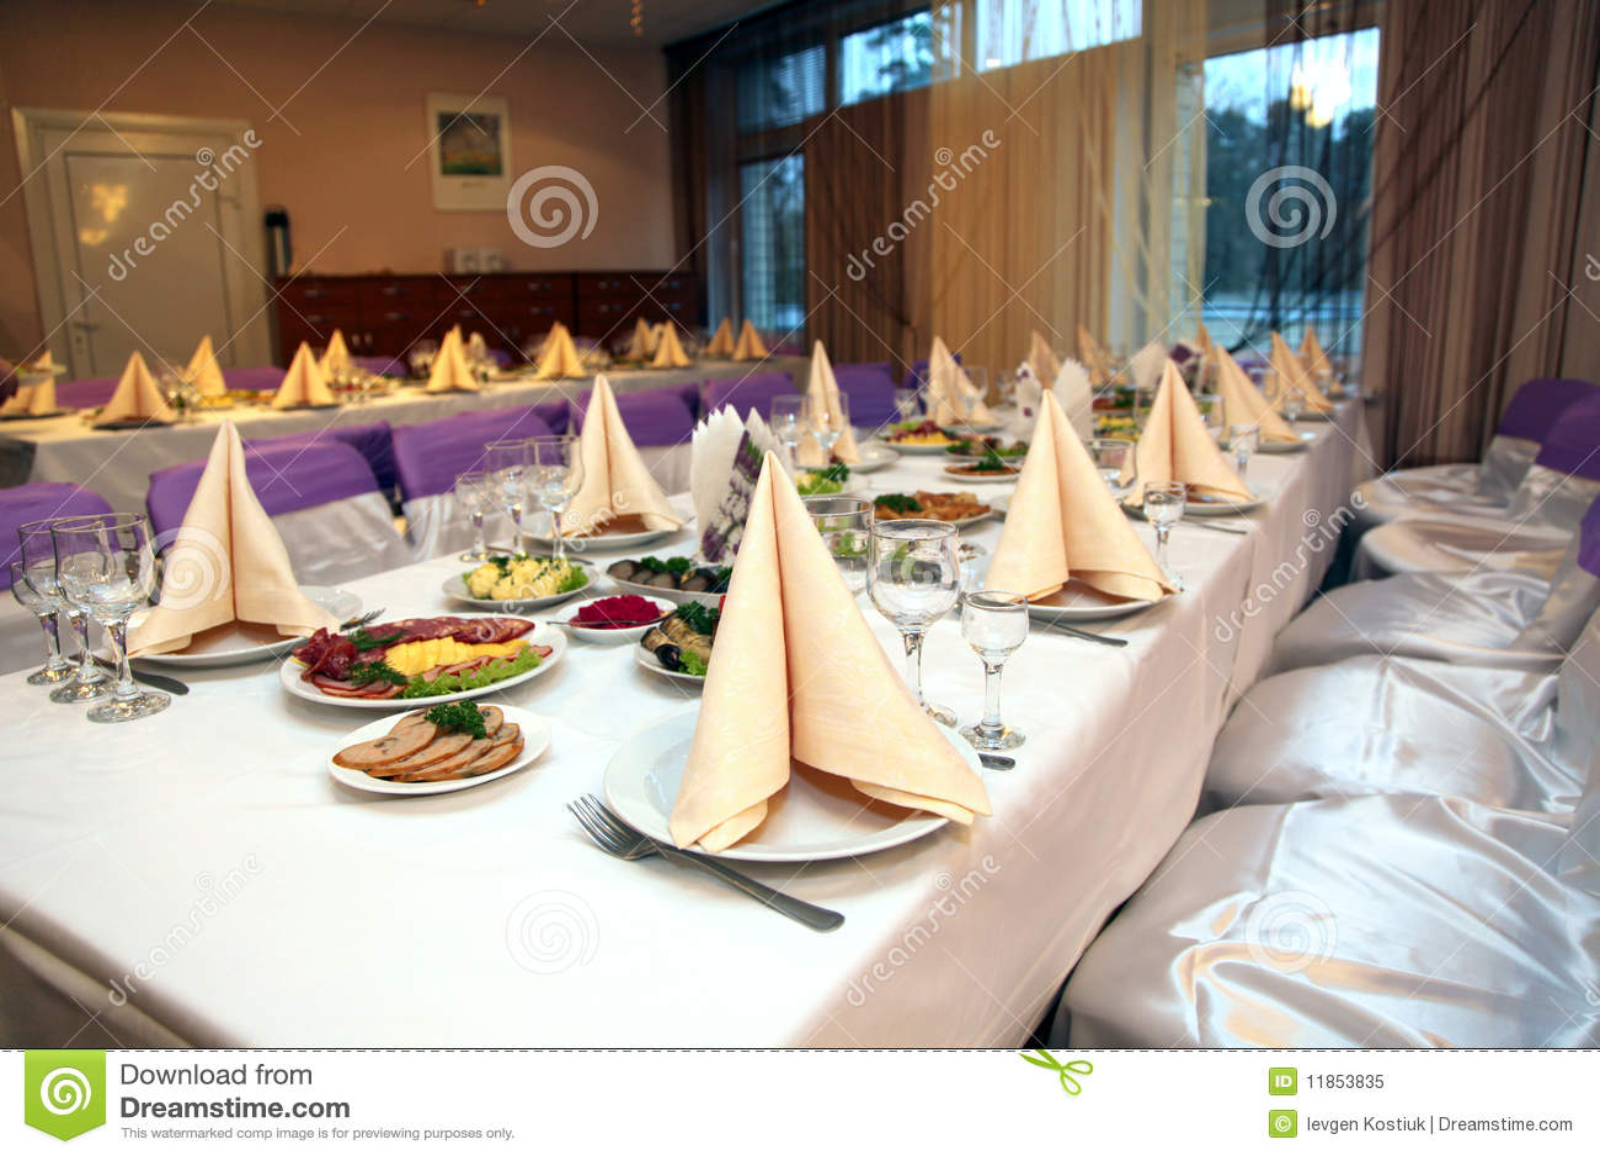 kitchen banquet tiny table 宴会食物表库存图片 图片包括有当事人 服务 邀请 厨房 彀子 牌照 宴会食物表